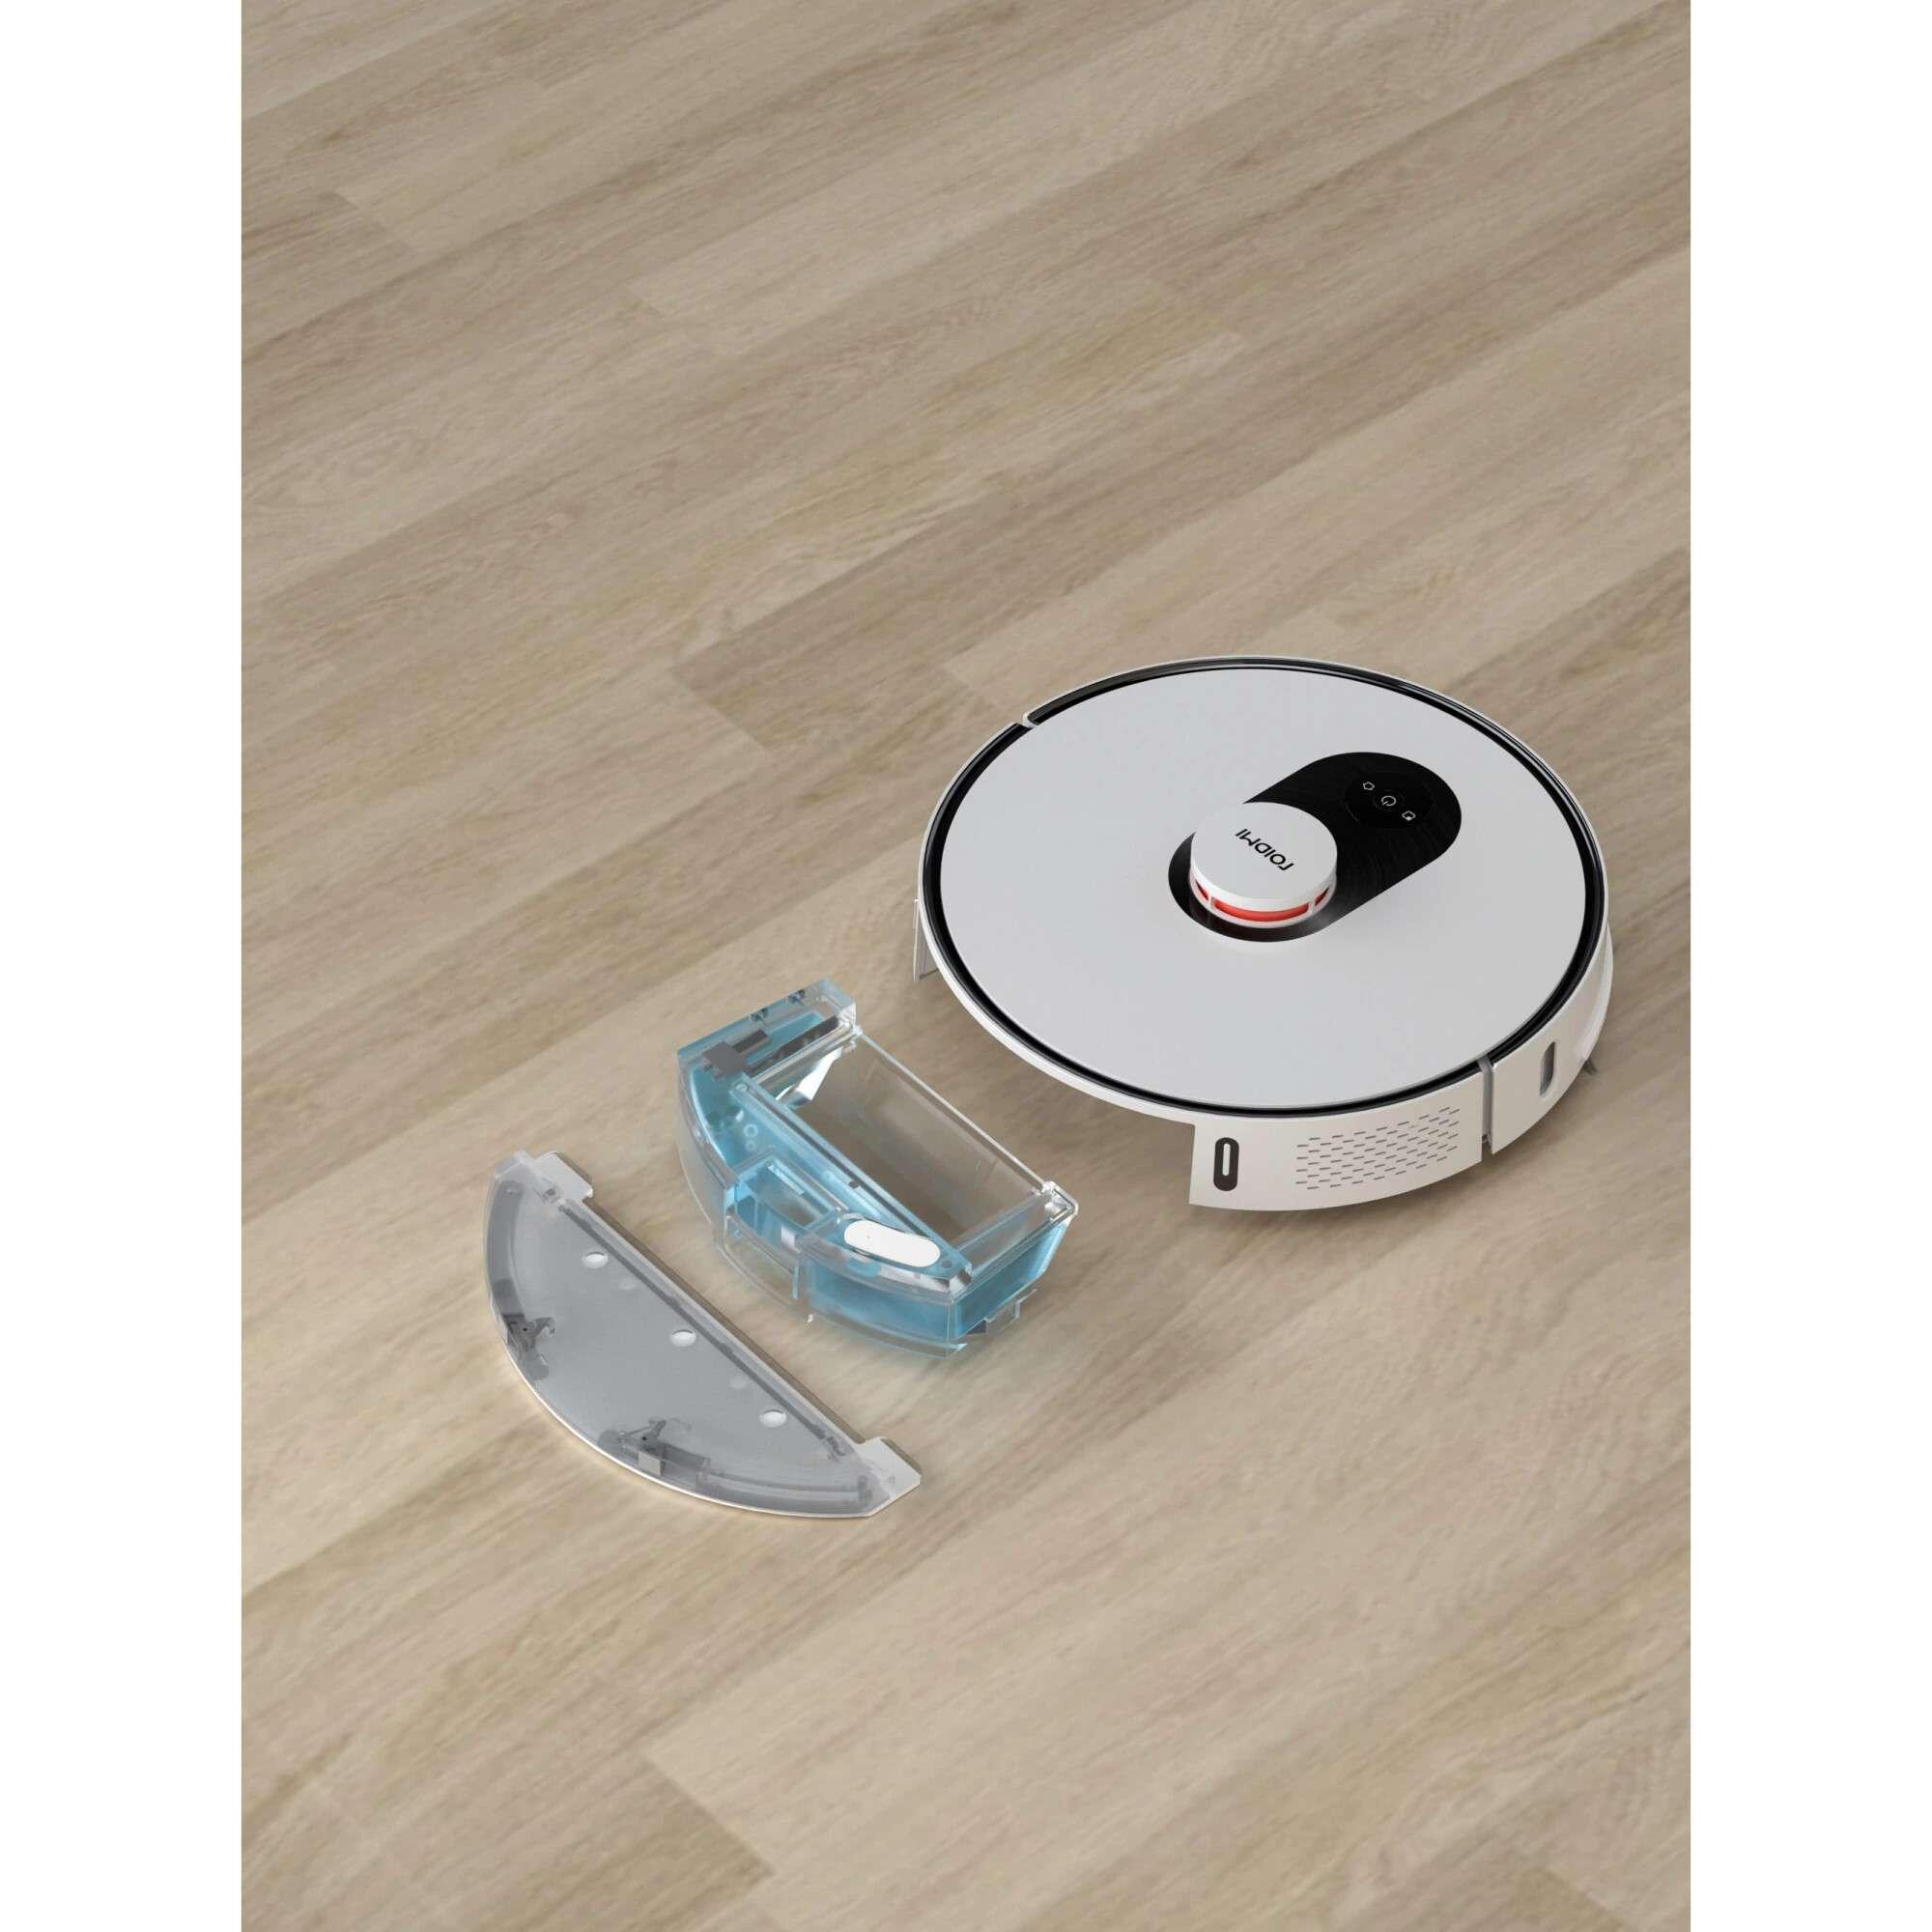 Robot de aspirare Roidmi Robot EVE Plus, Mop, 50W, 5200mAh, Putere de absorbtie 2700Pa, Colectare praf 3l, Alb 4